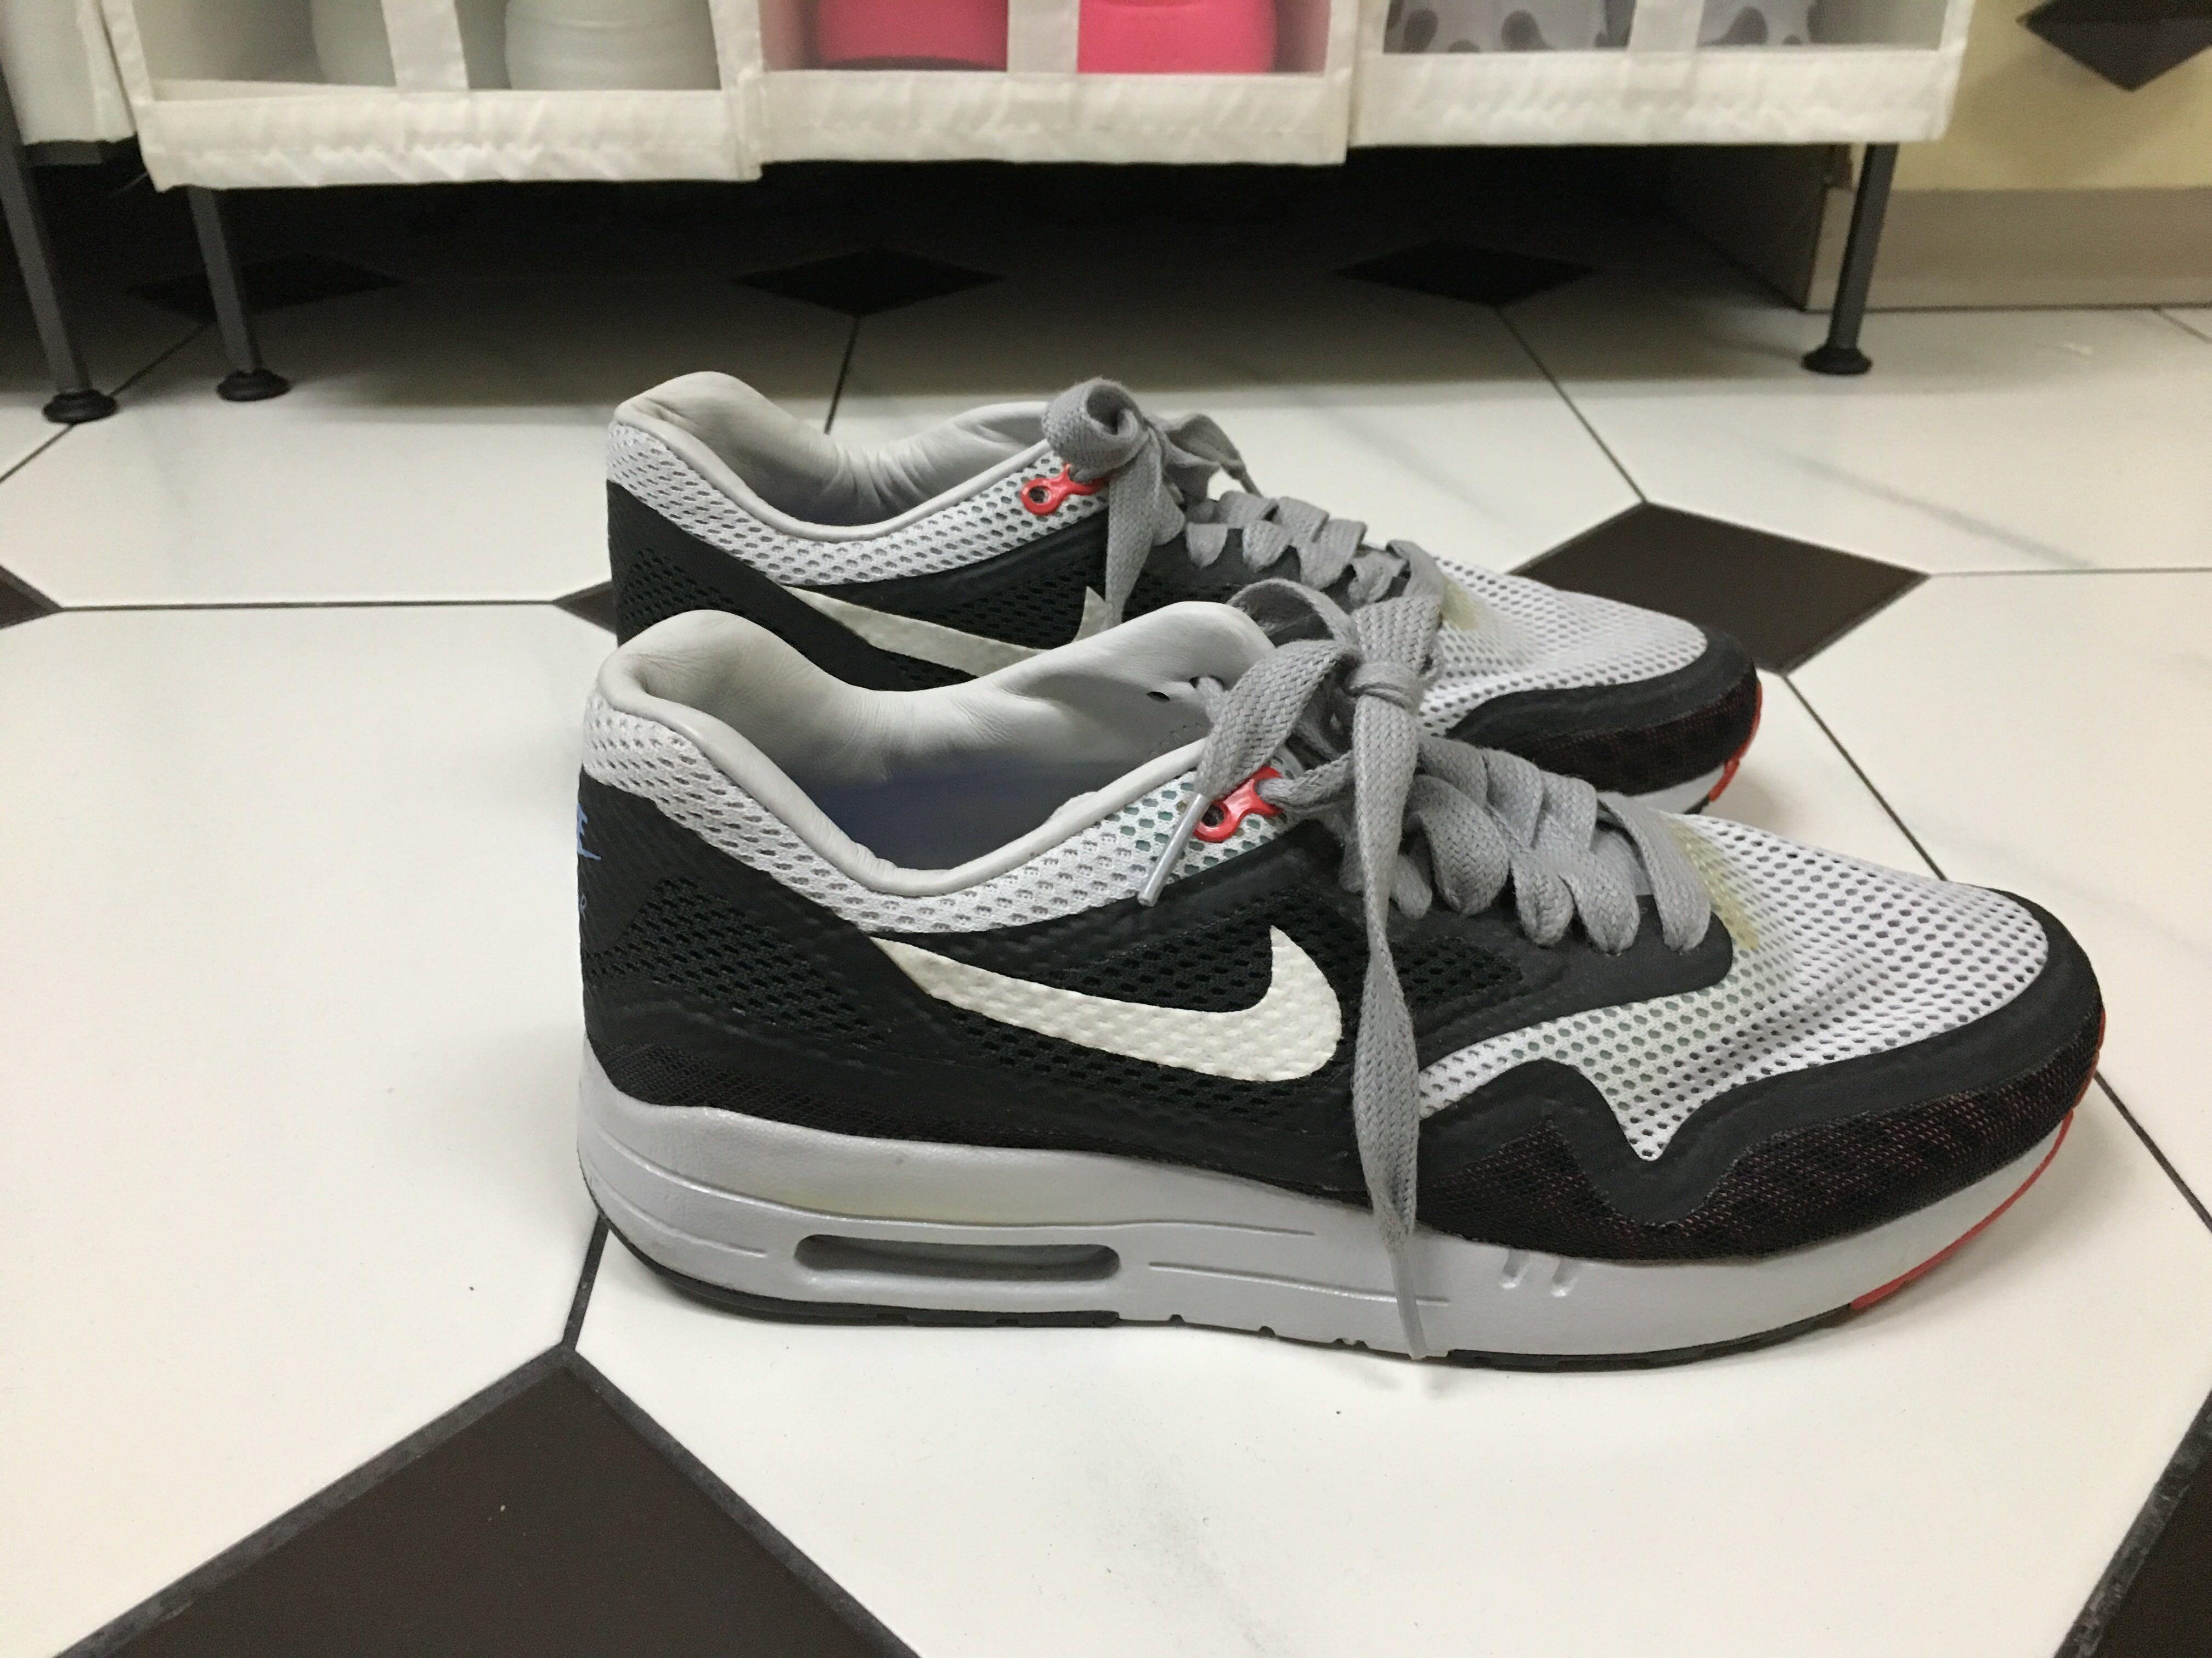 sale retailer a4b4c a6cac NIKE Air Max 95 City QS (London), Mens Fashion, Footwear, Slippers   Sandals on Carousell